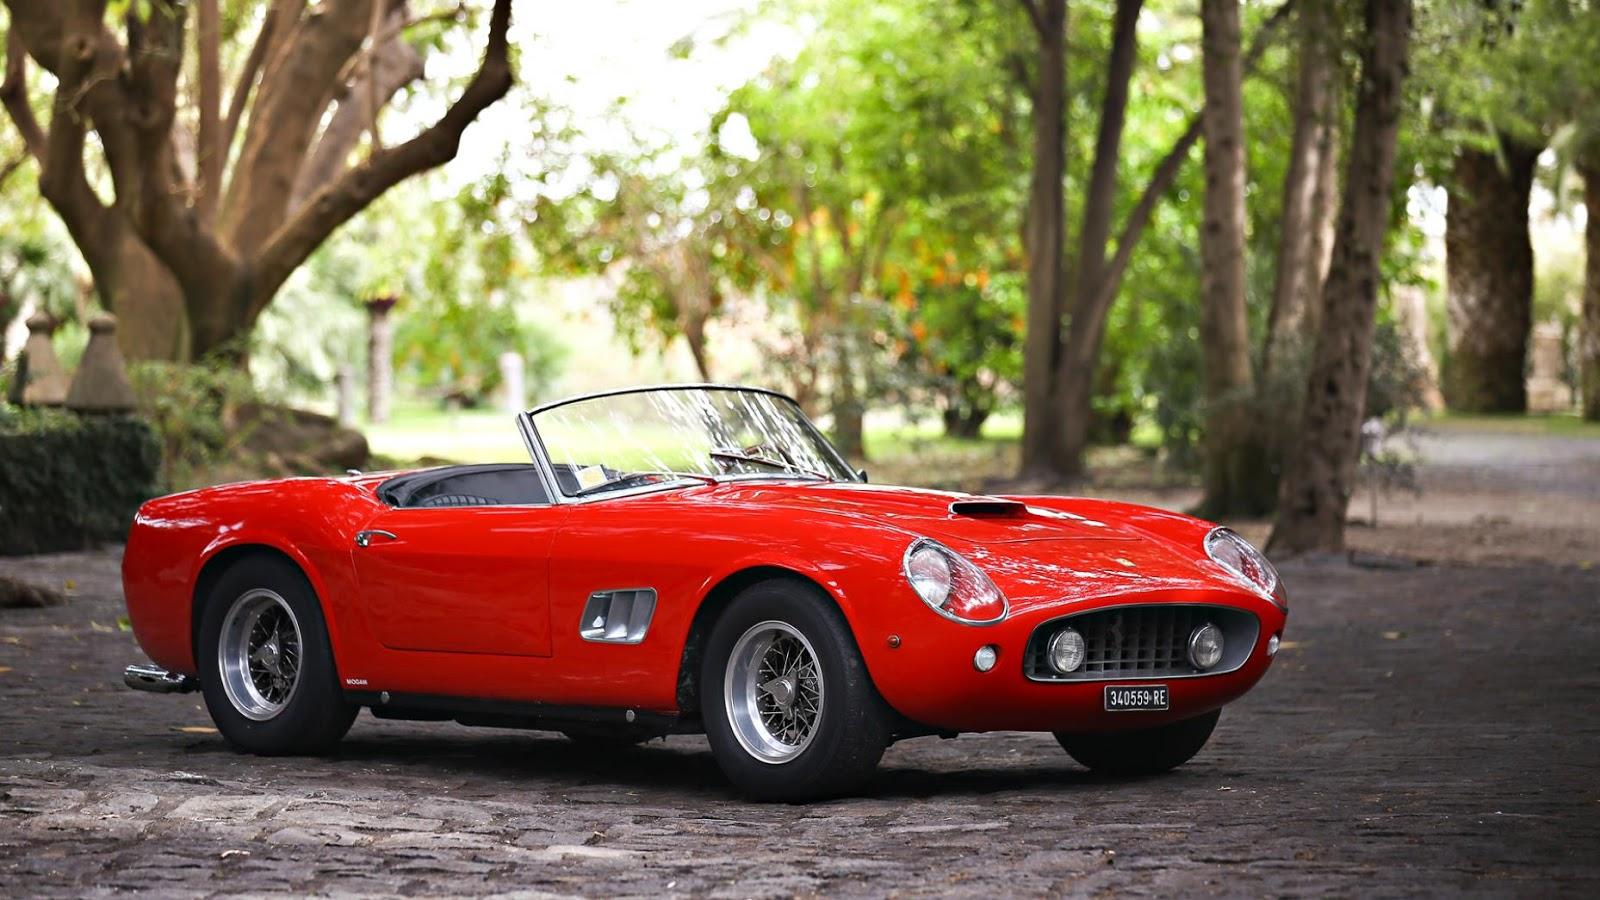 1961 Ferrari 250 GT California SWB Spyder (closed headlight): $17,160,000